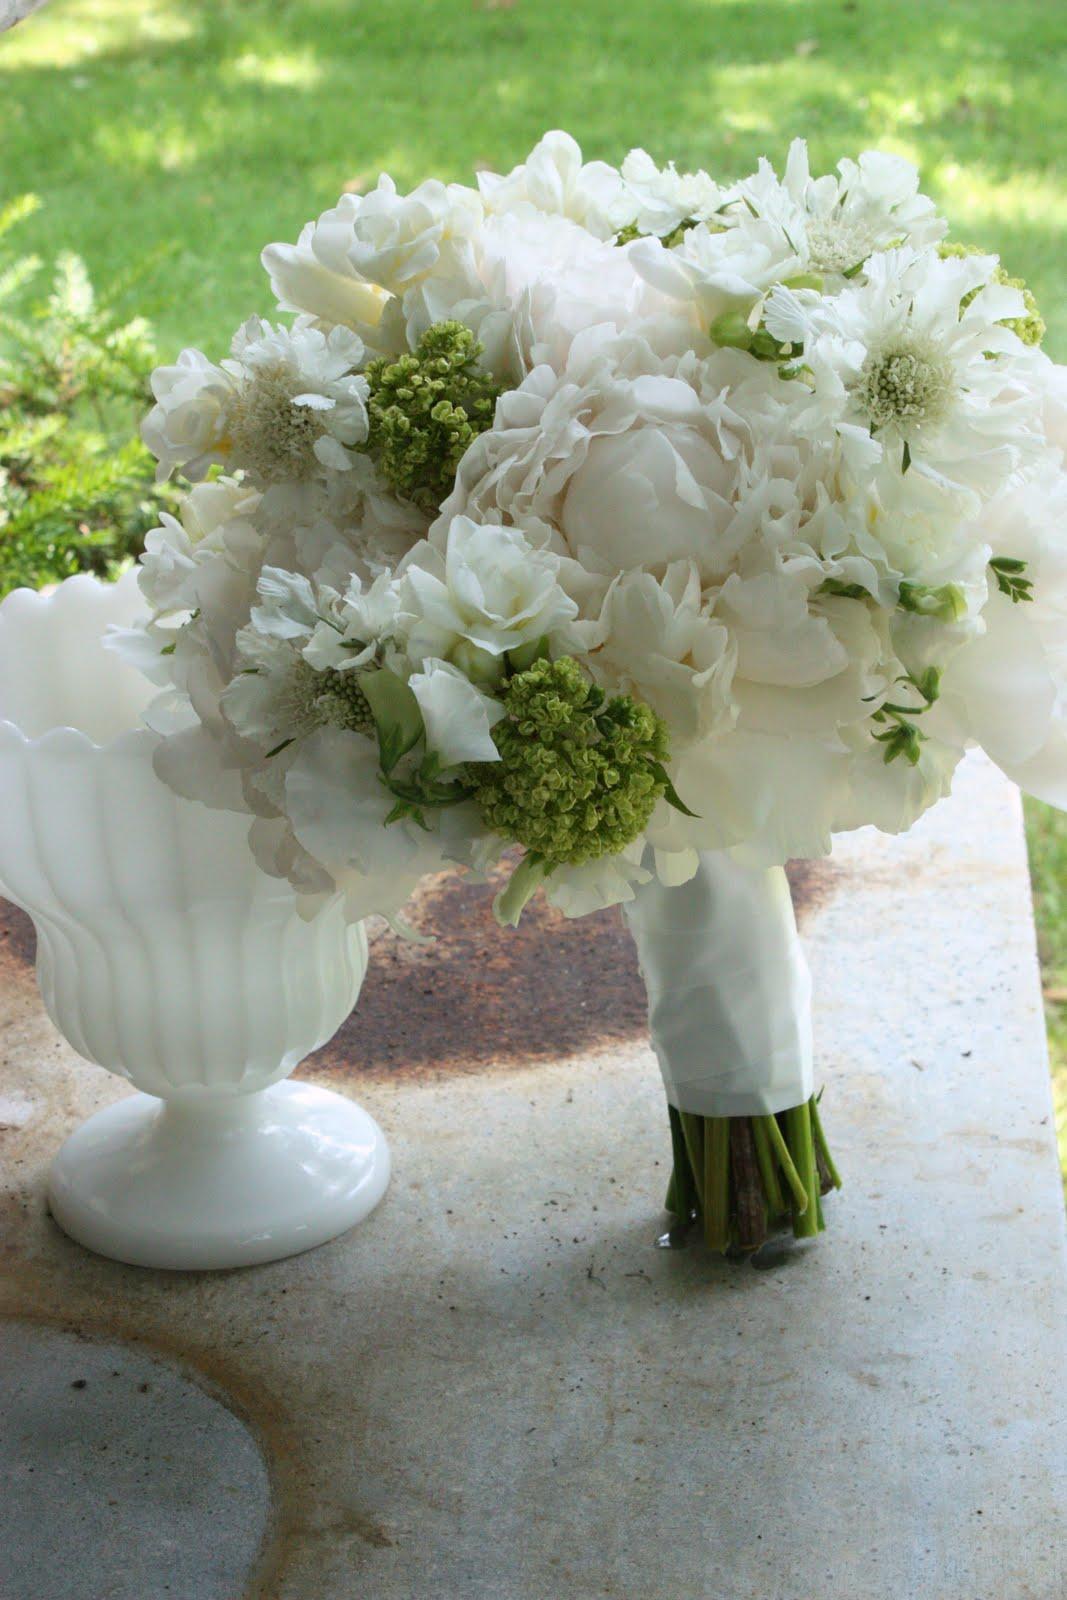 BLUSH Floral Design: Madison Beach Club Green & White Wedding